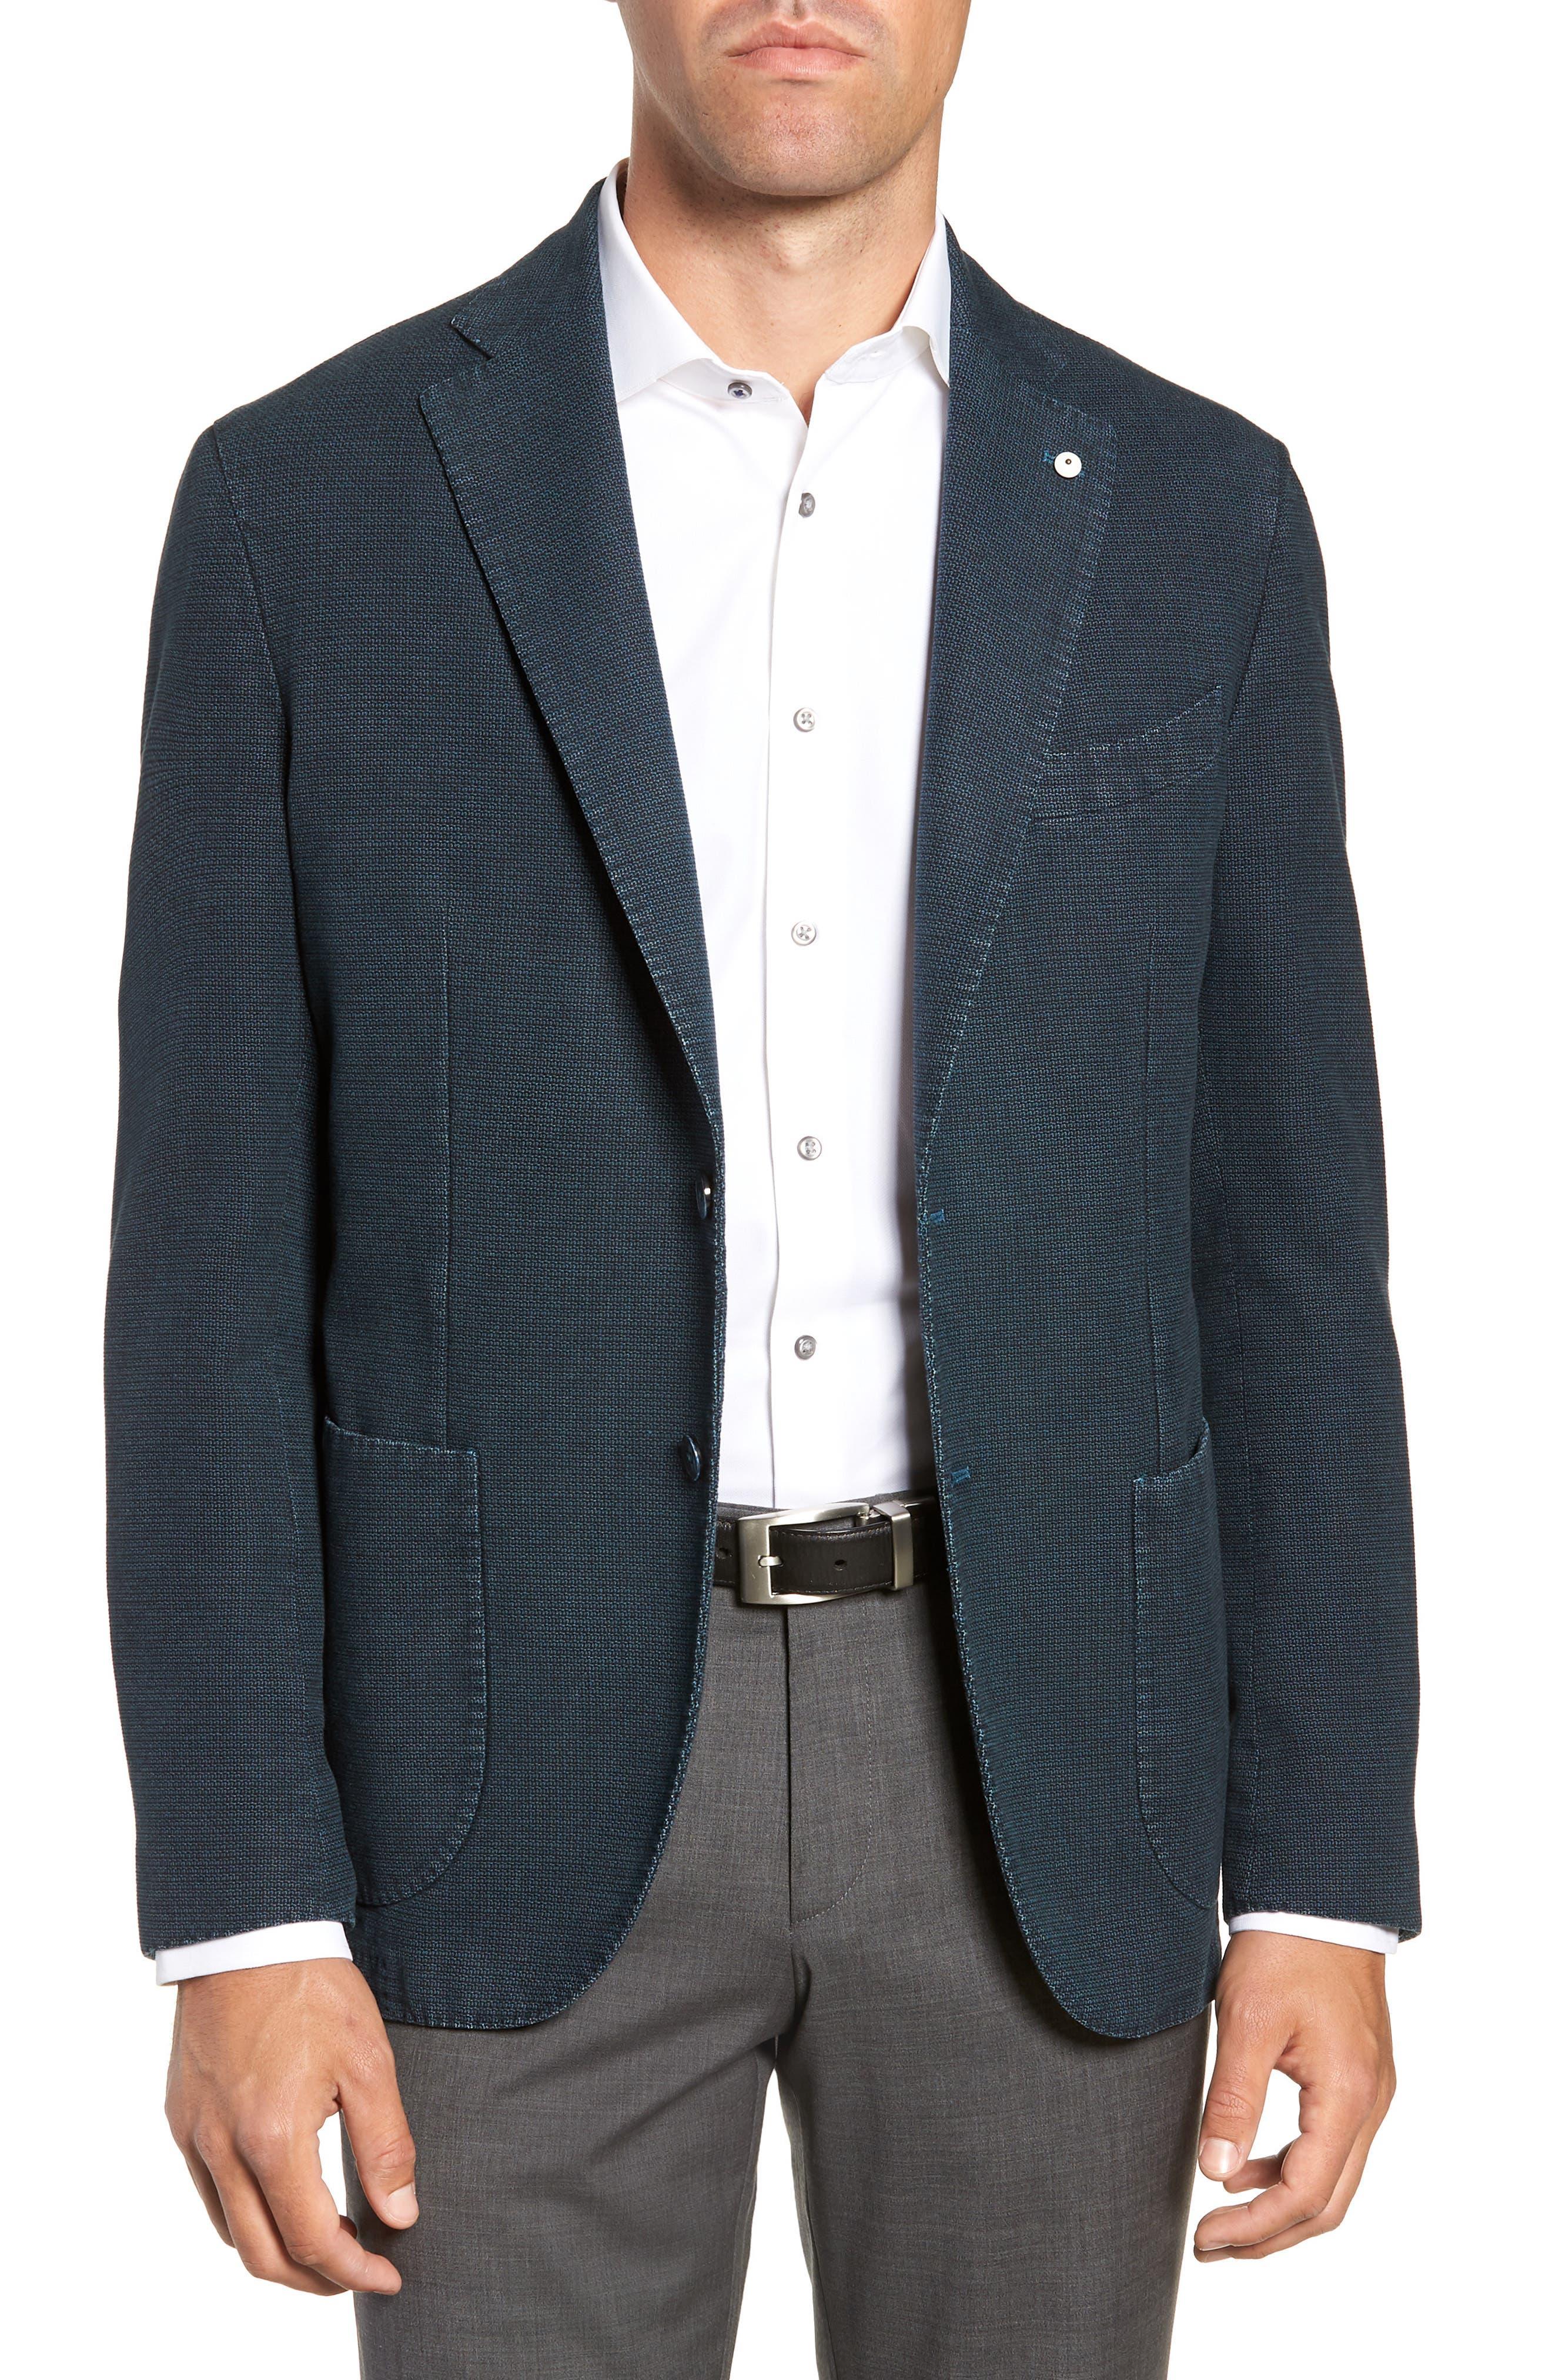 L.B.M. L.B.M 1911 Classic Fit Cotton Sport Coat in Blue/ Green